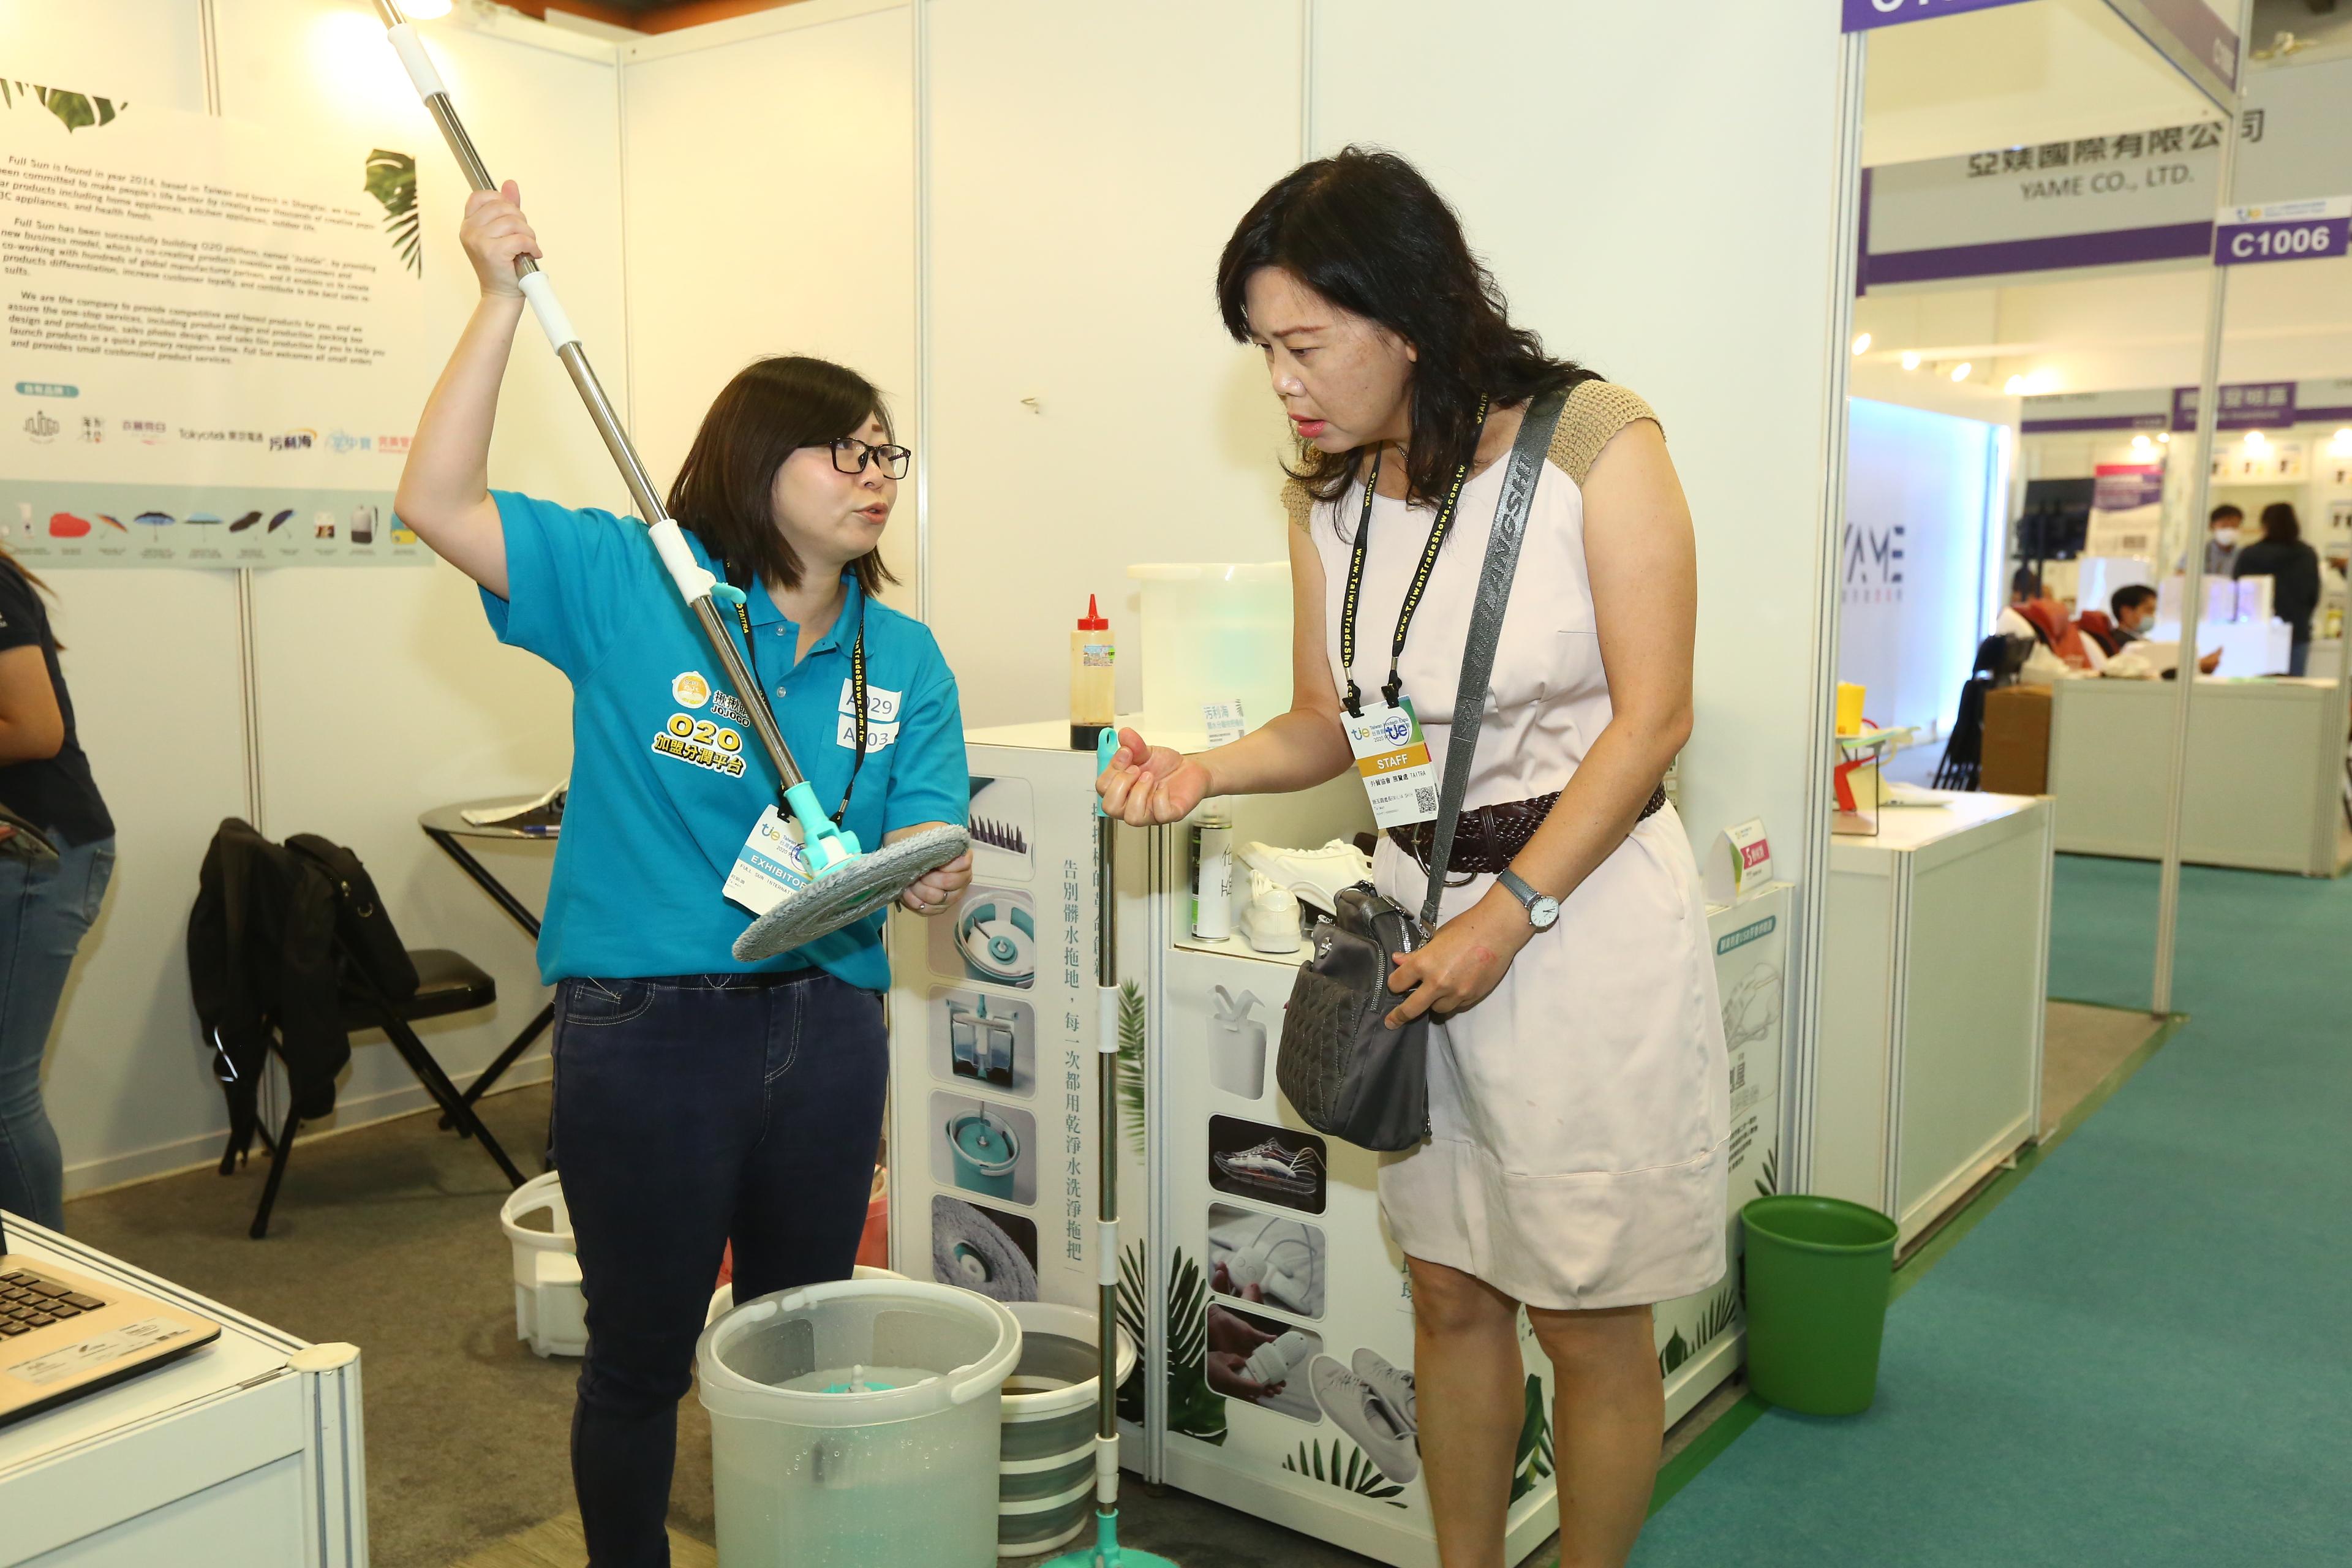 https://storage.googleapis.com/www.taiwantradeshow.com.tw/activity-photo/202009/T-52071877-name.jpg